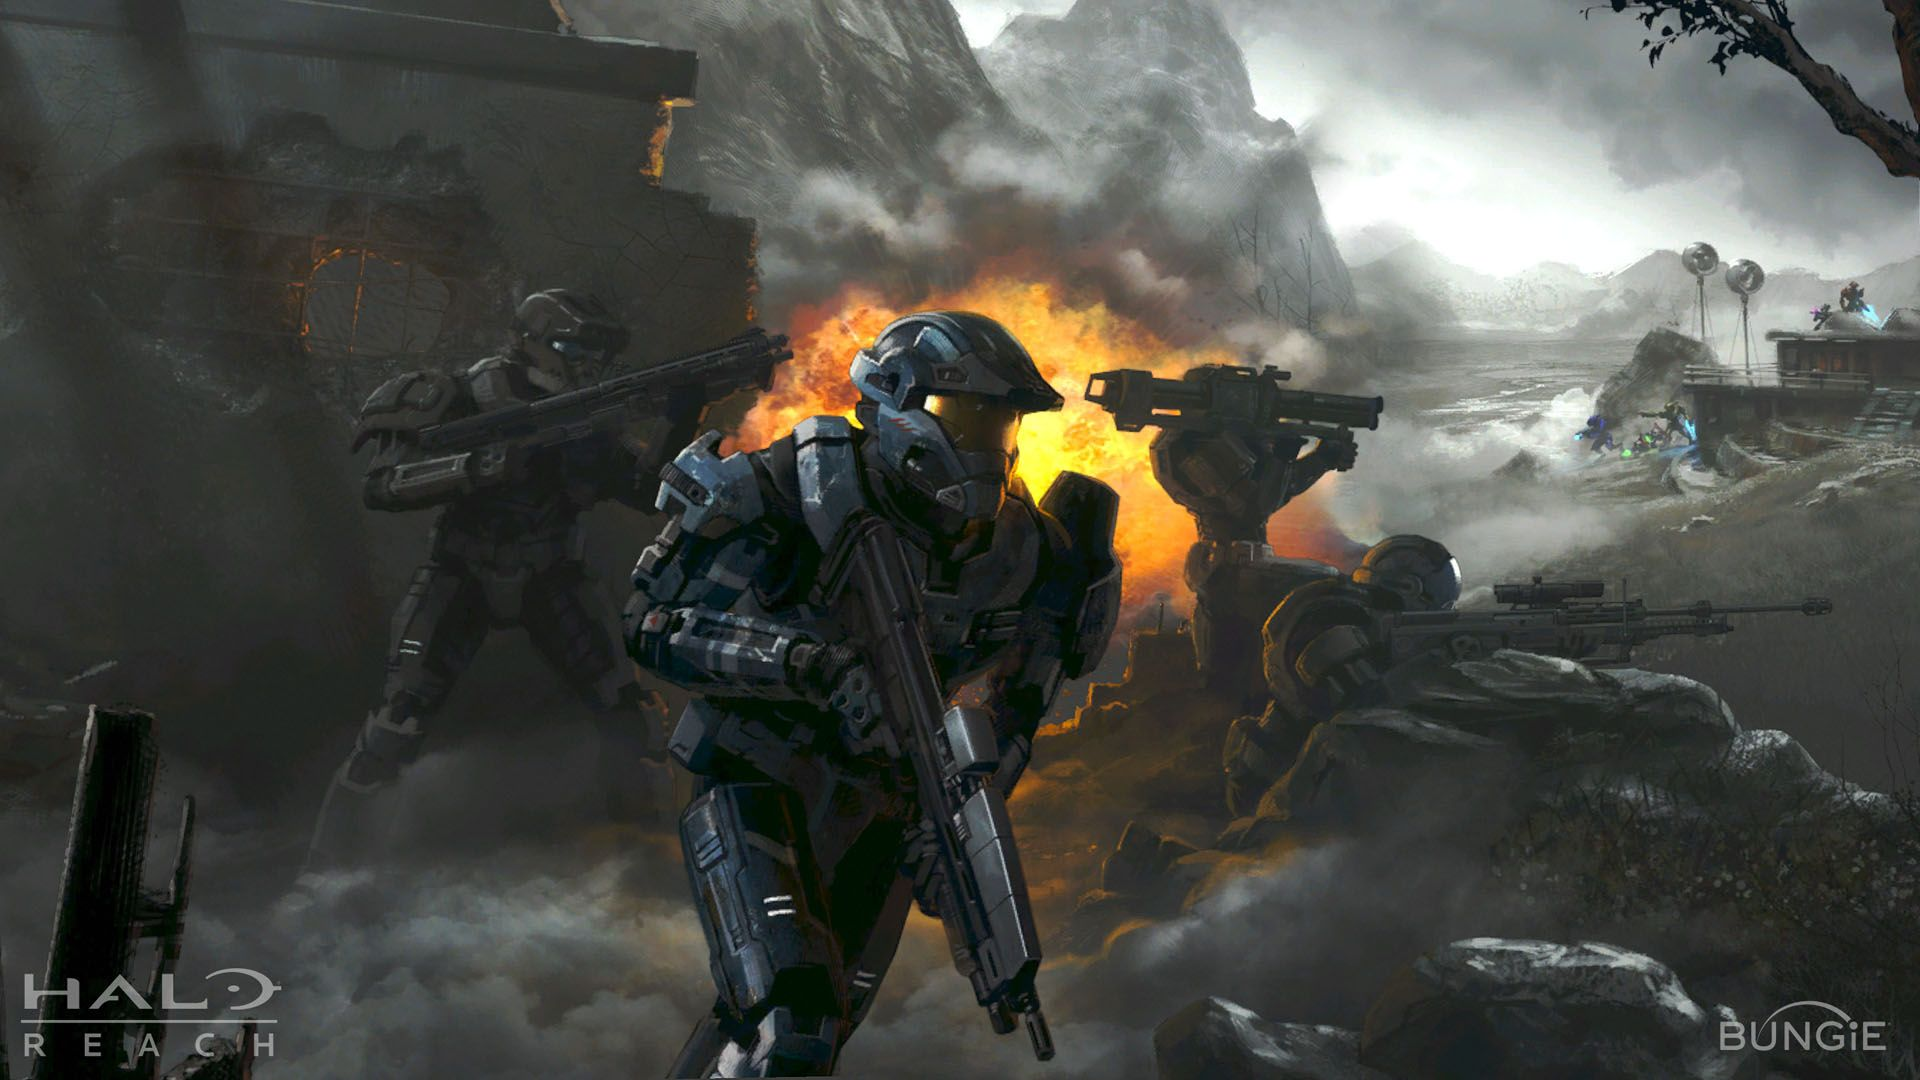 Halo Reach Multiplayer Halo Reach Halo Spartan Halo